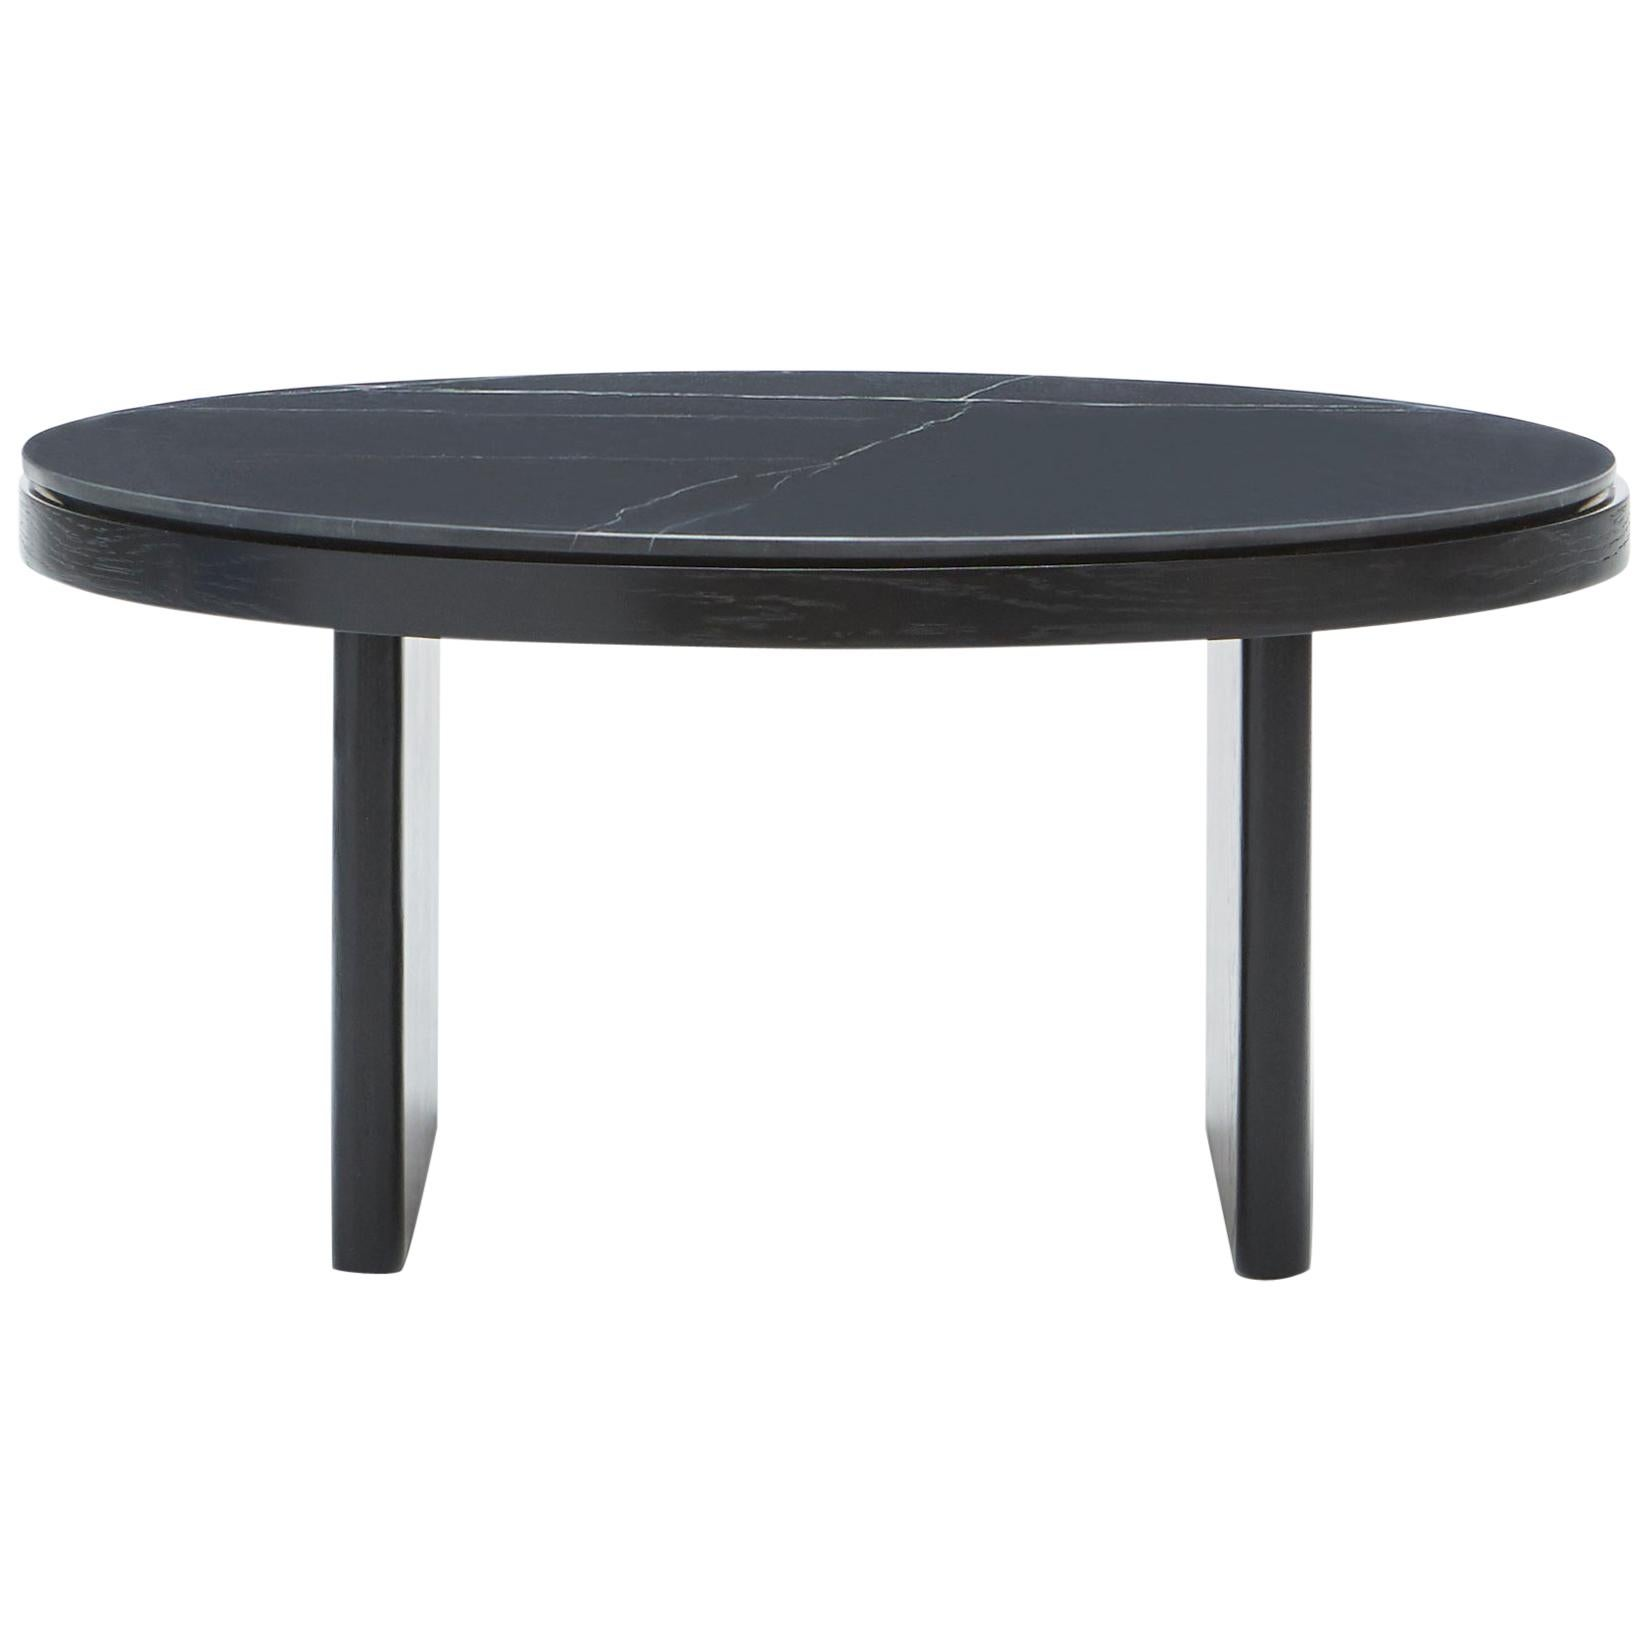 Anza Black Carrara Marble Coffee Table